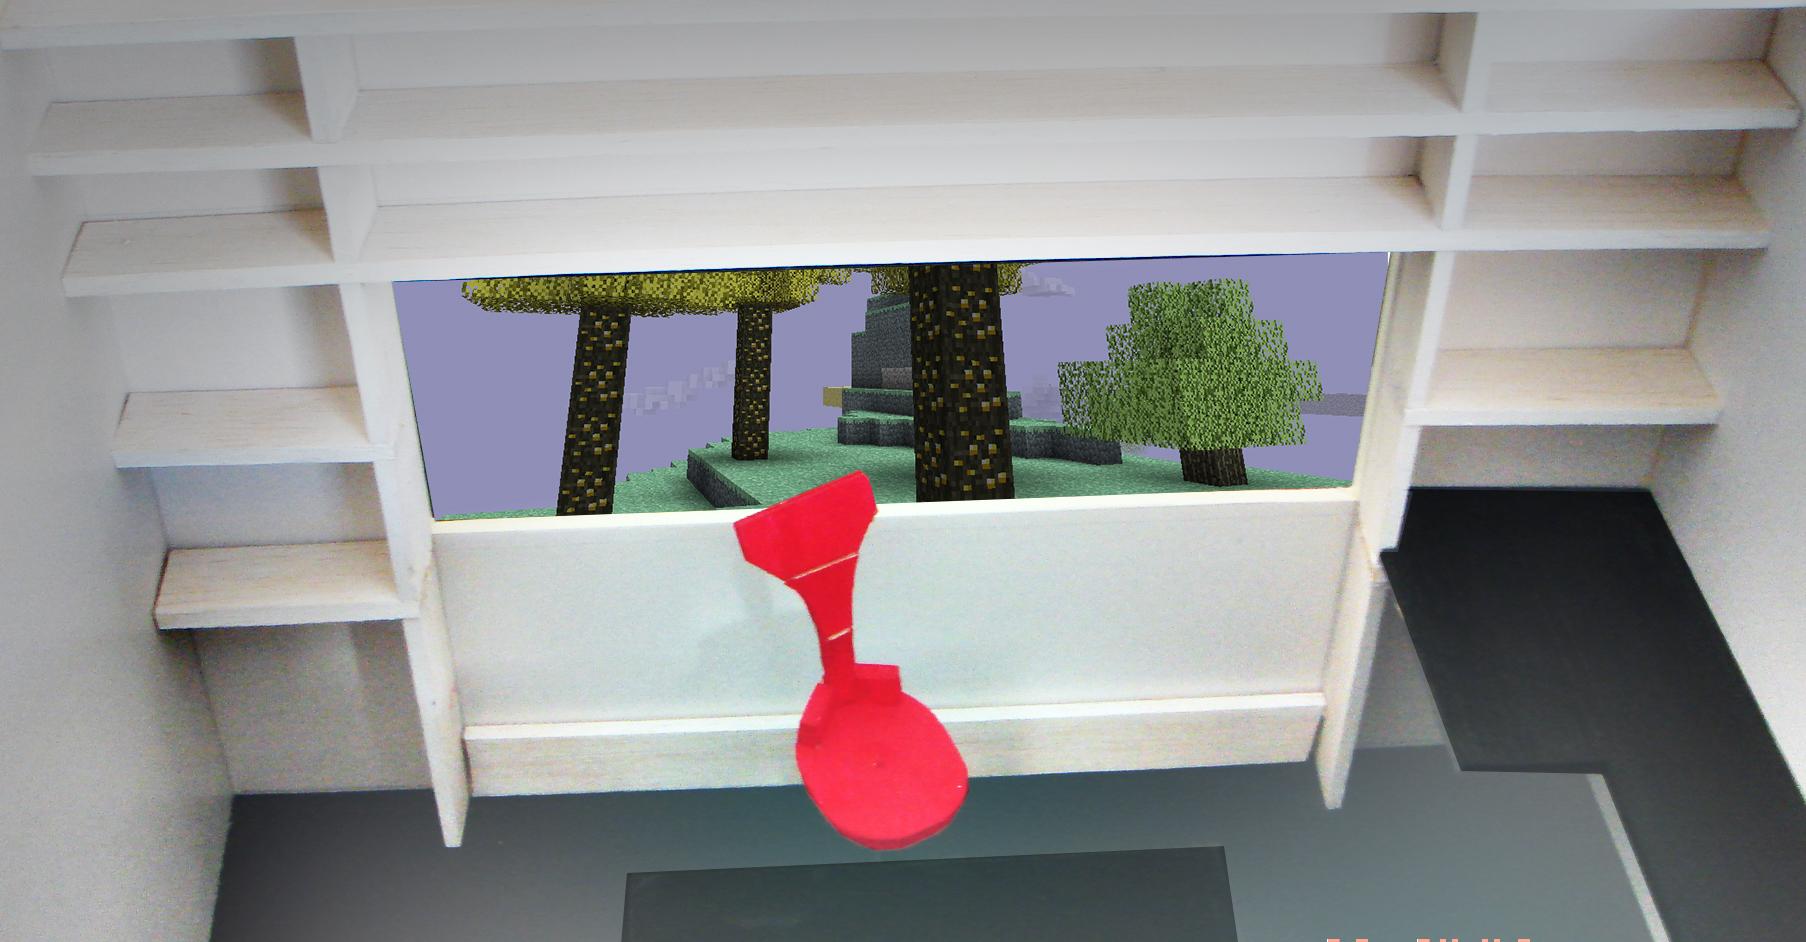 pentestudio-model-scrapmodel